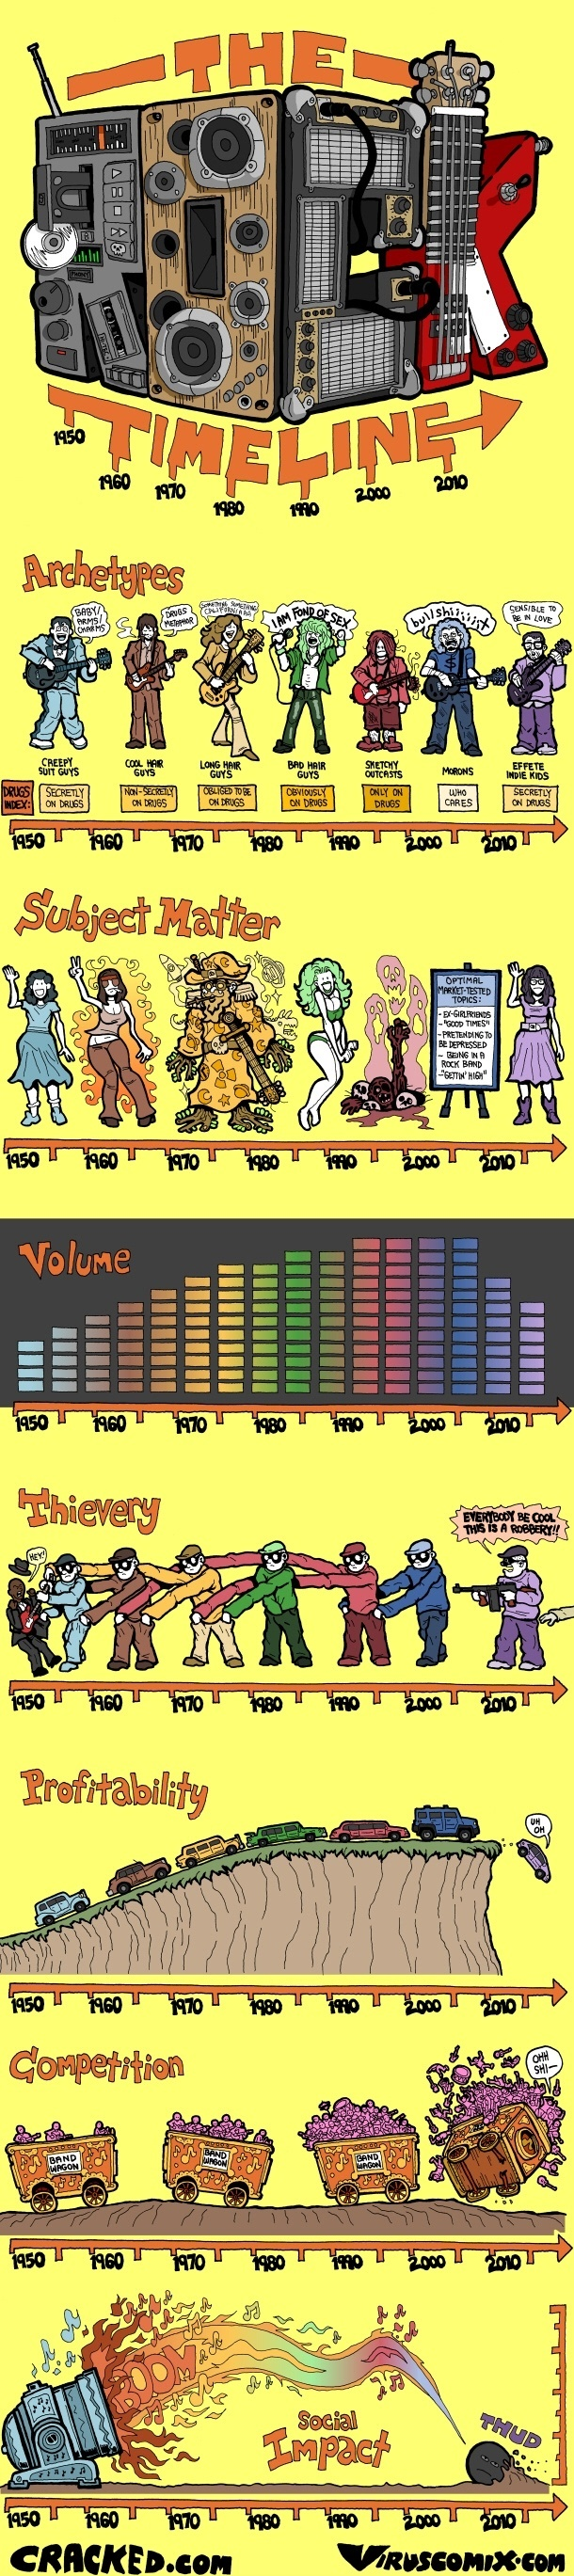 The Rock Timeline